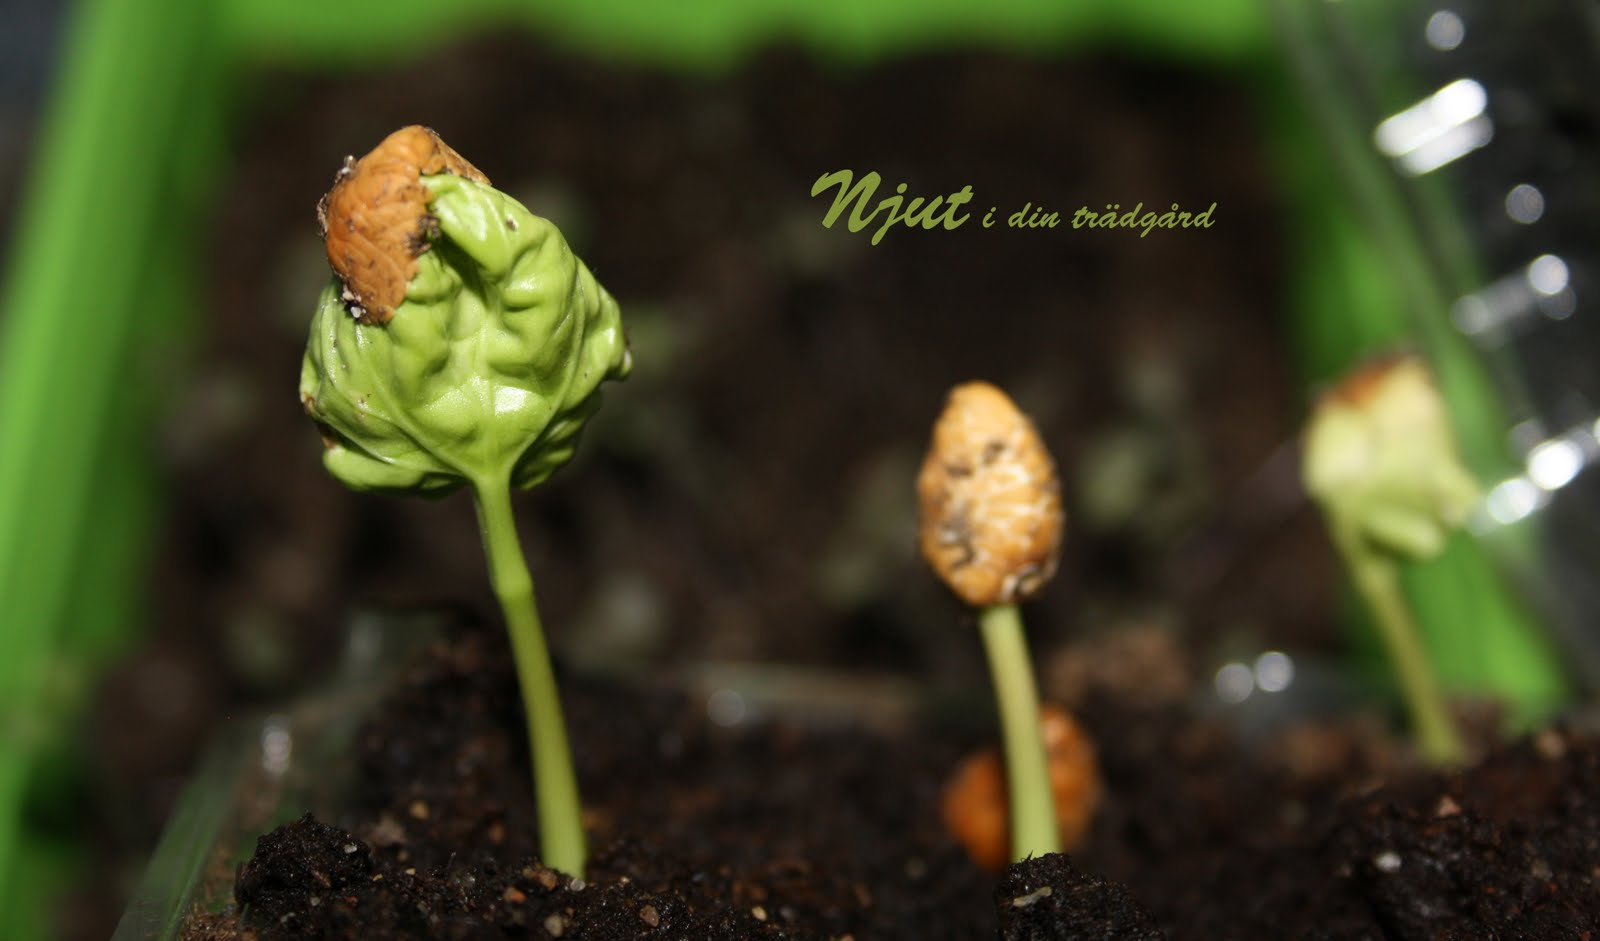 Njut i din trädgård: april 2010